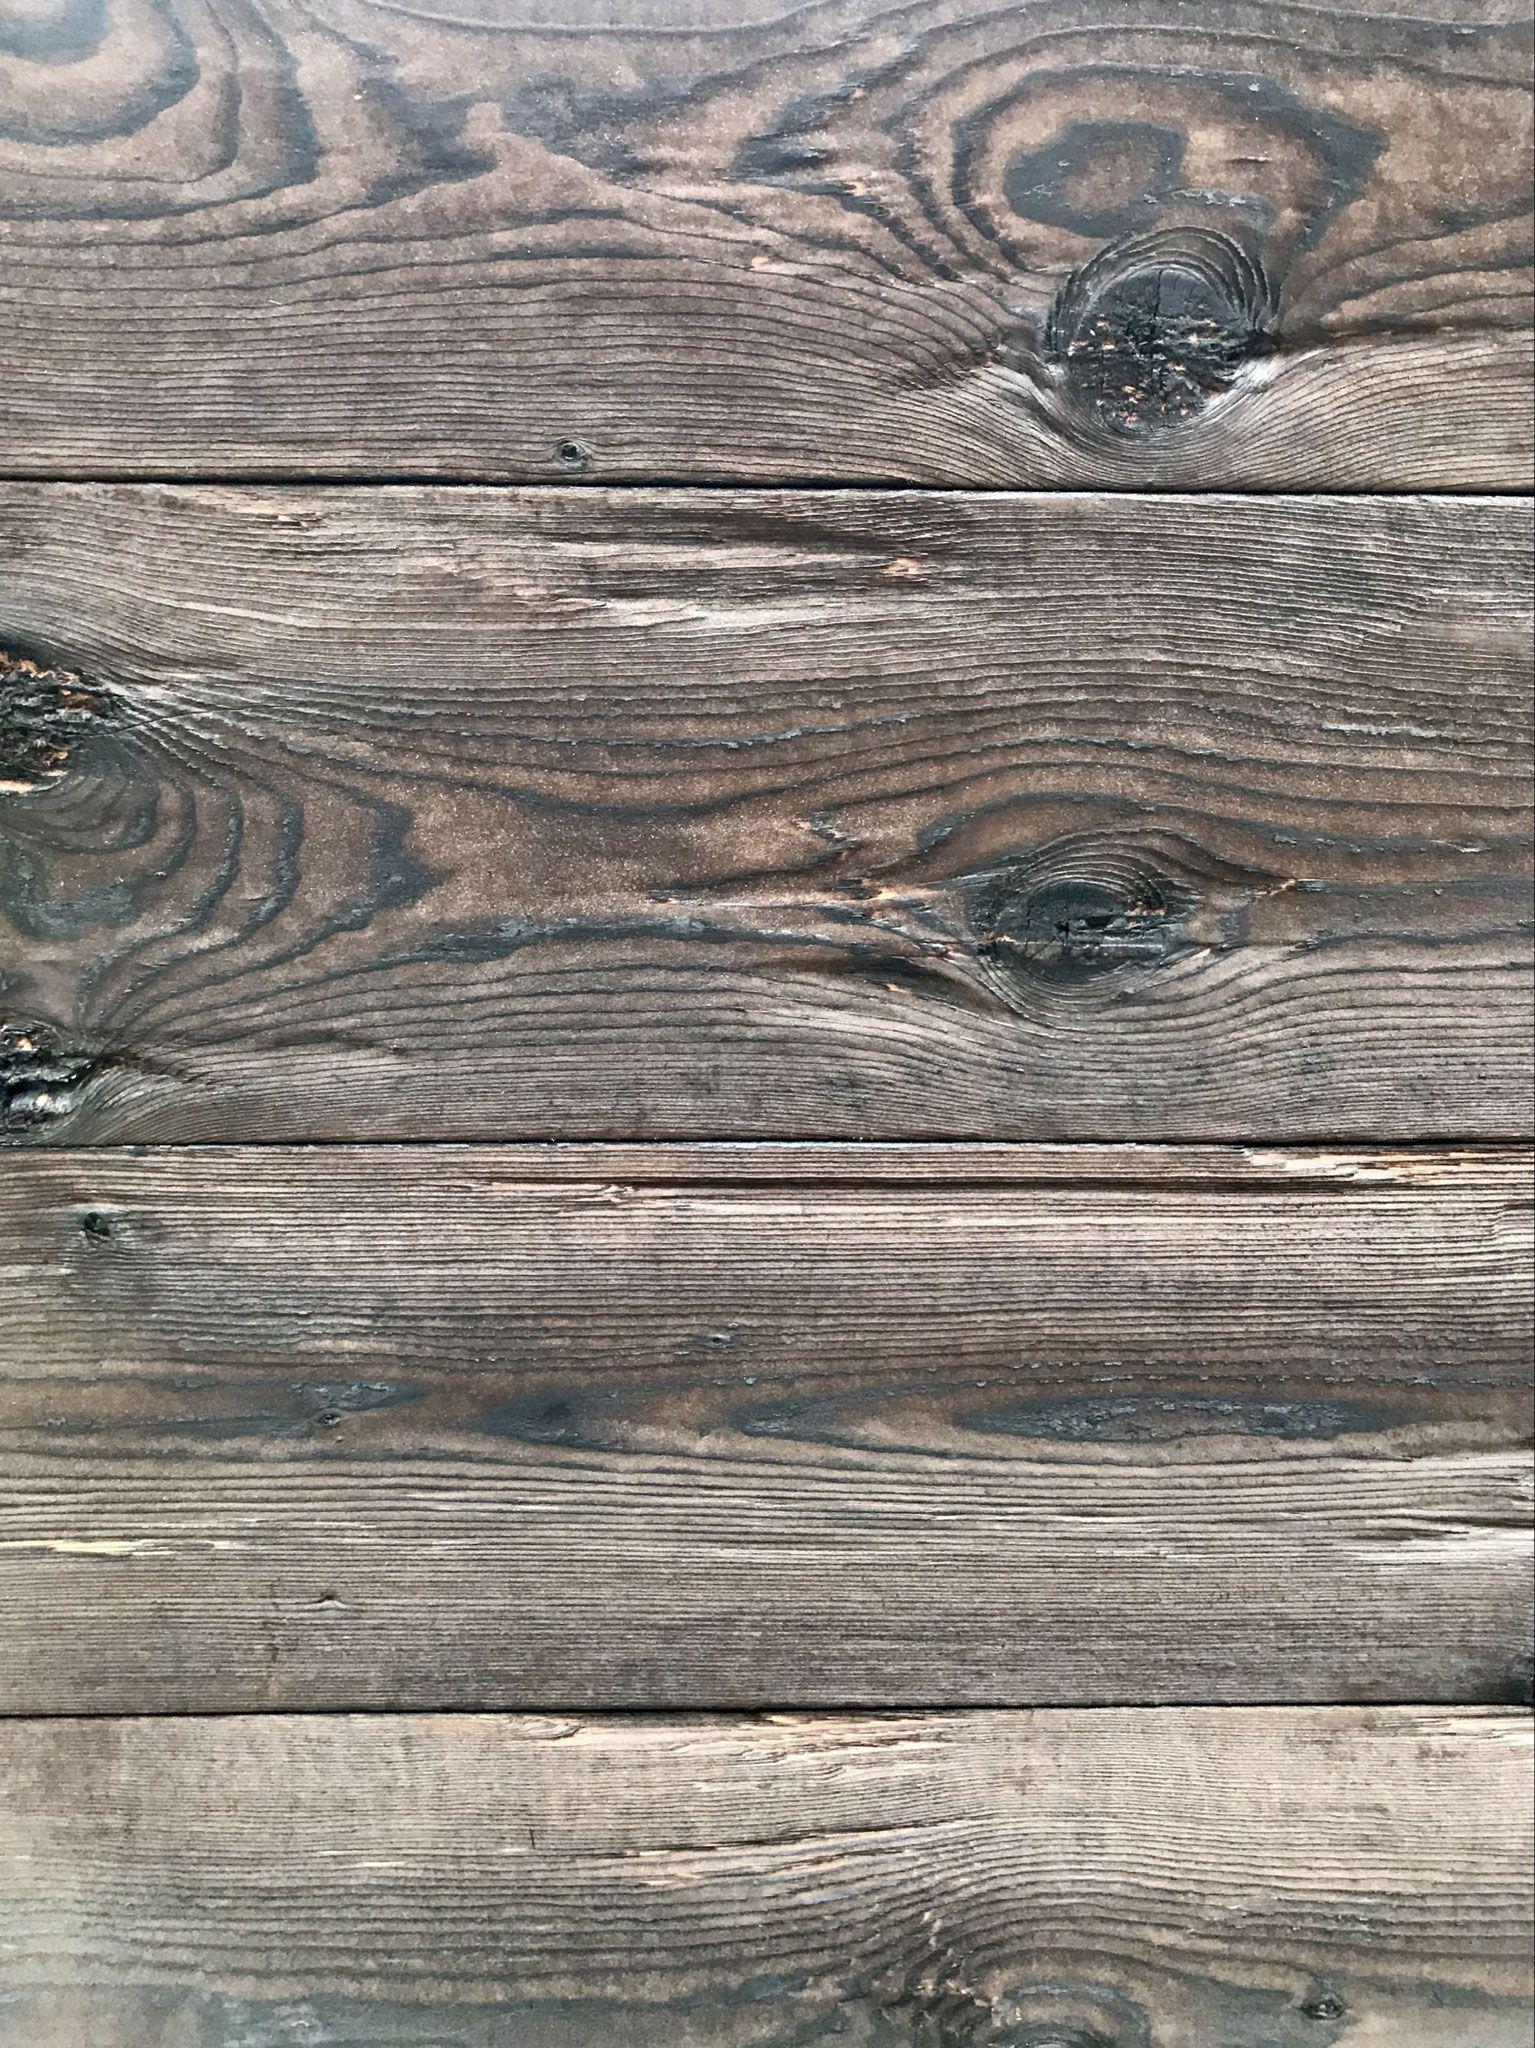 Fichte Natur Vintage Holz Altholz Wandverkleidung Vintage Holz Wandverkleidung